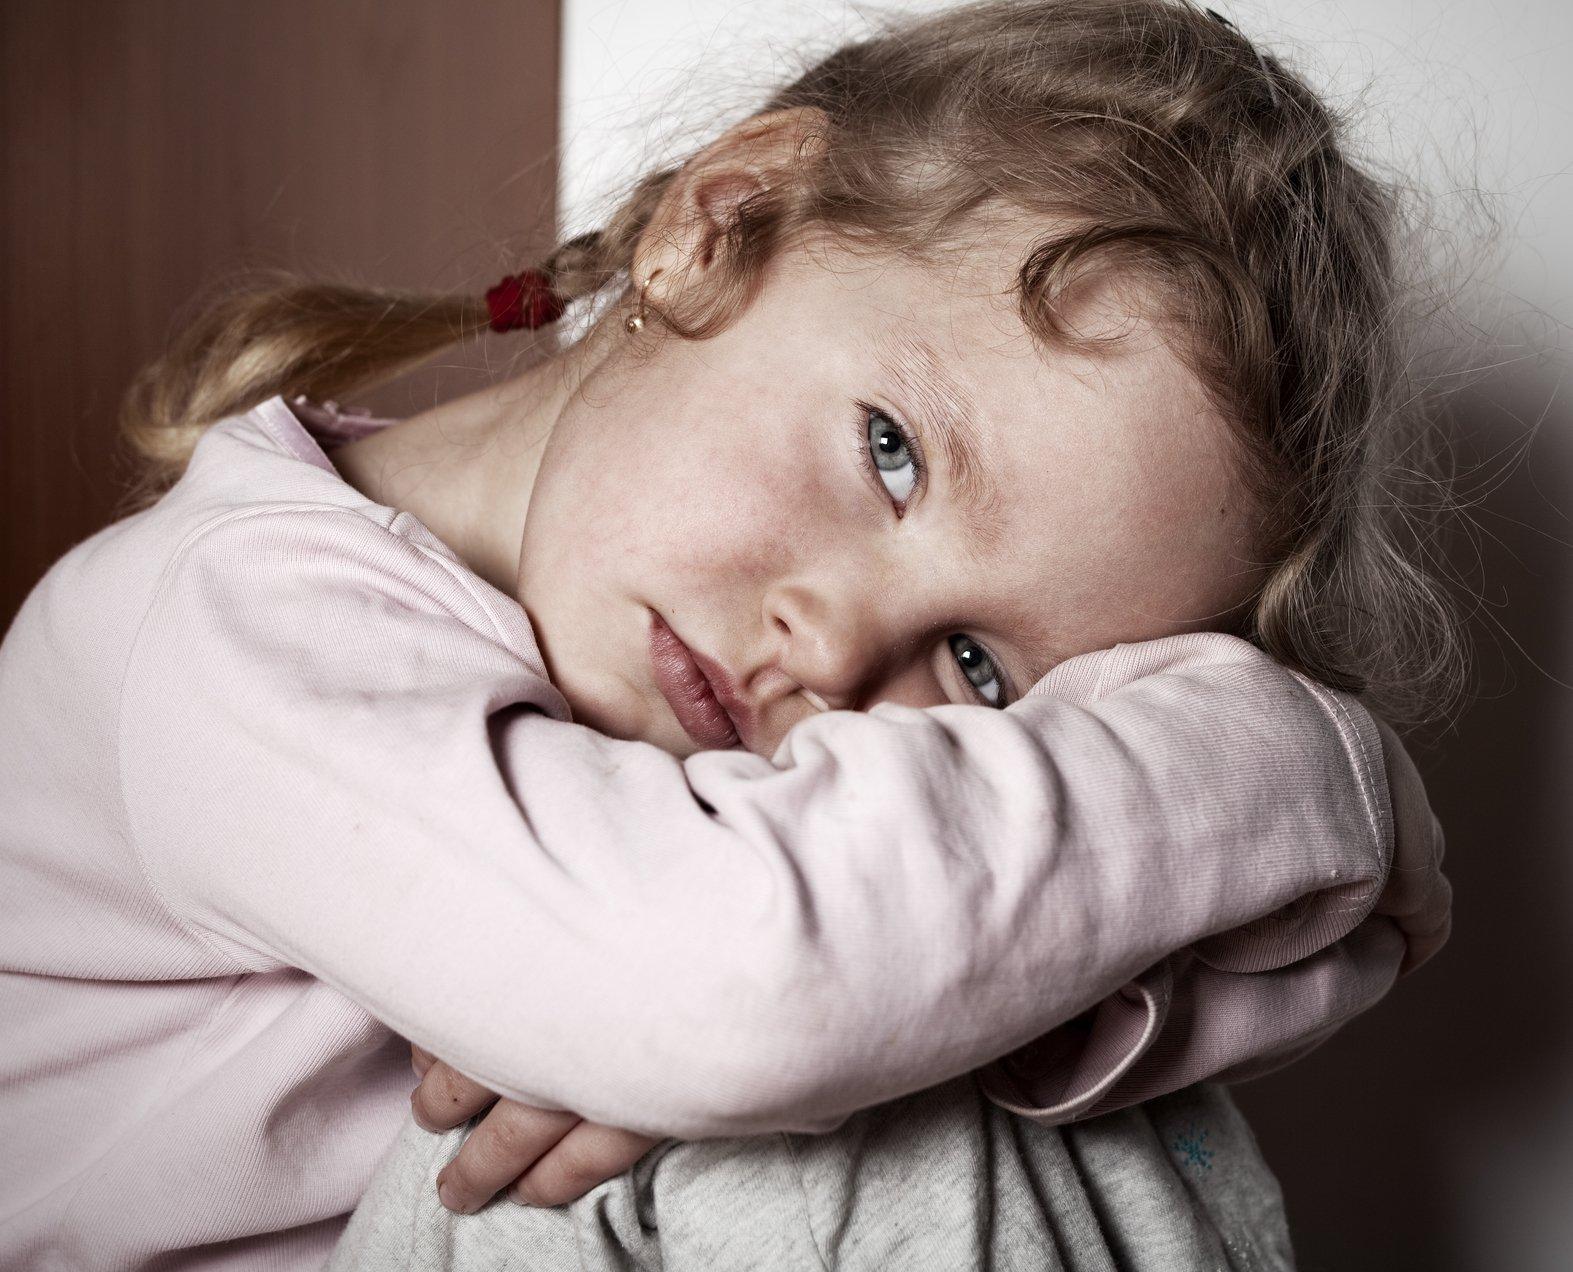 Sad littl girl. Child's problems